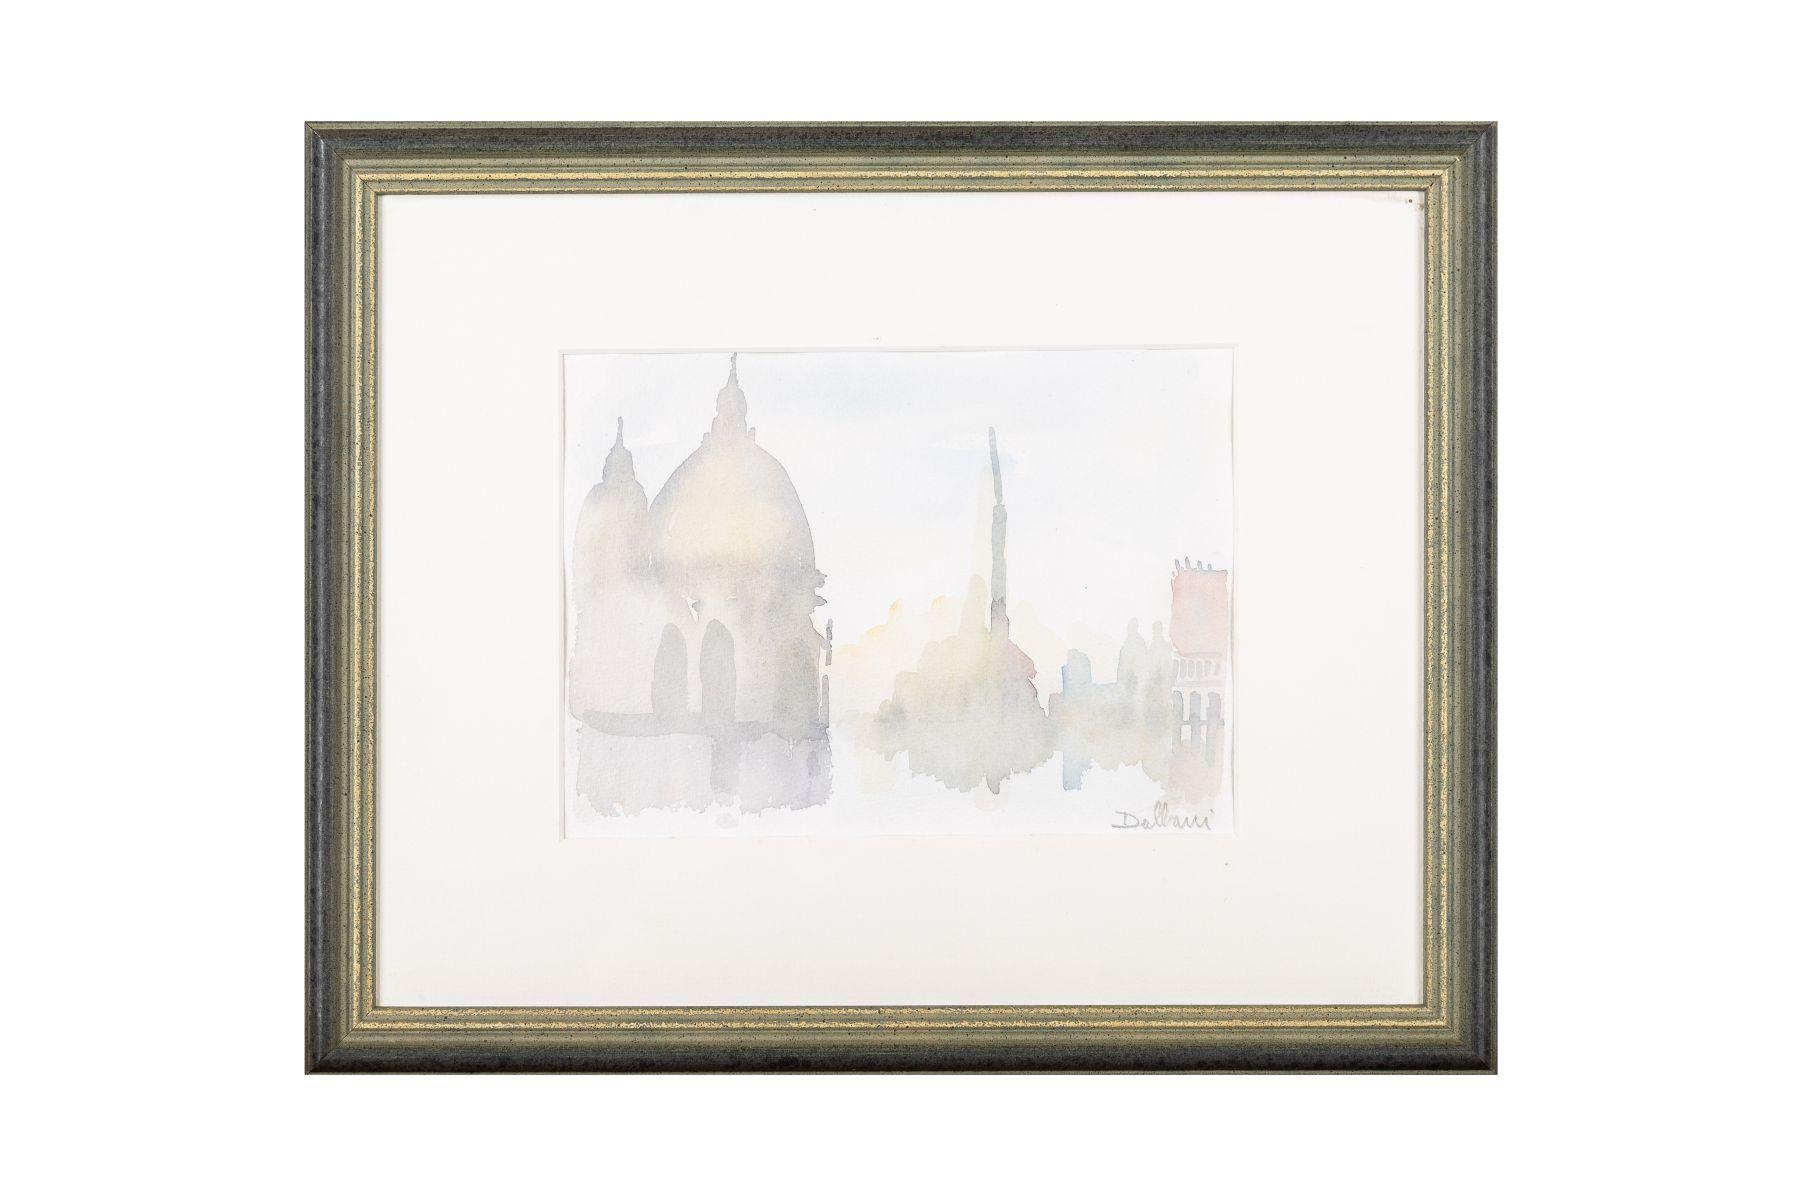 "#42 Attilio Dalbani, ""motif from Venice"" | Attilio Dalbani, ""Motiv aus Venedig"" Image"